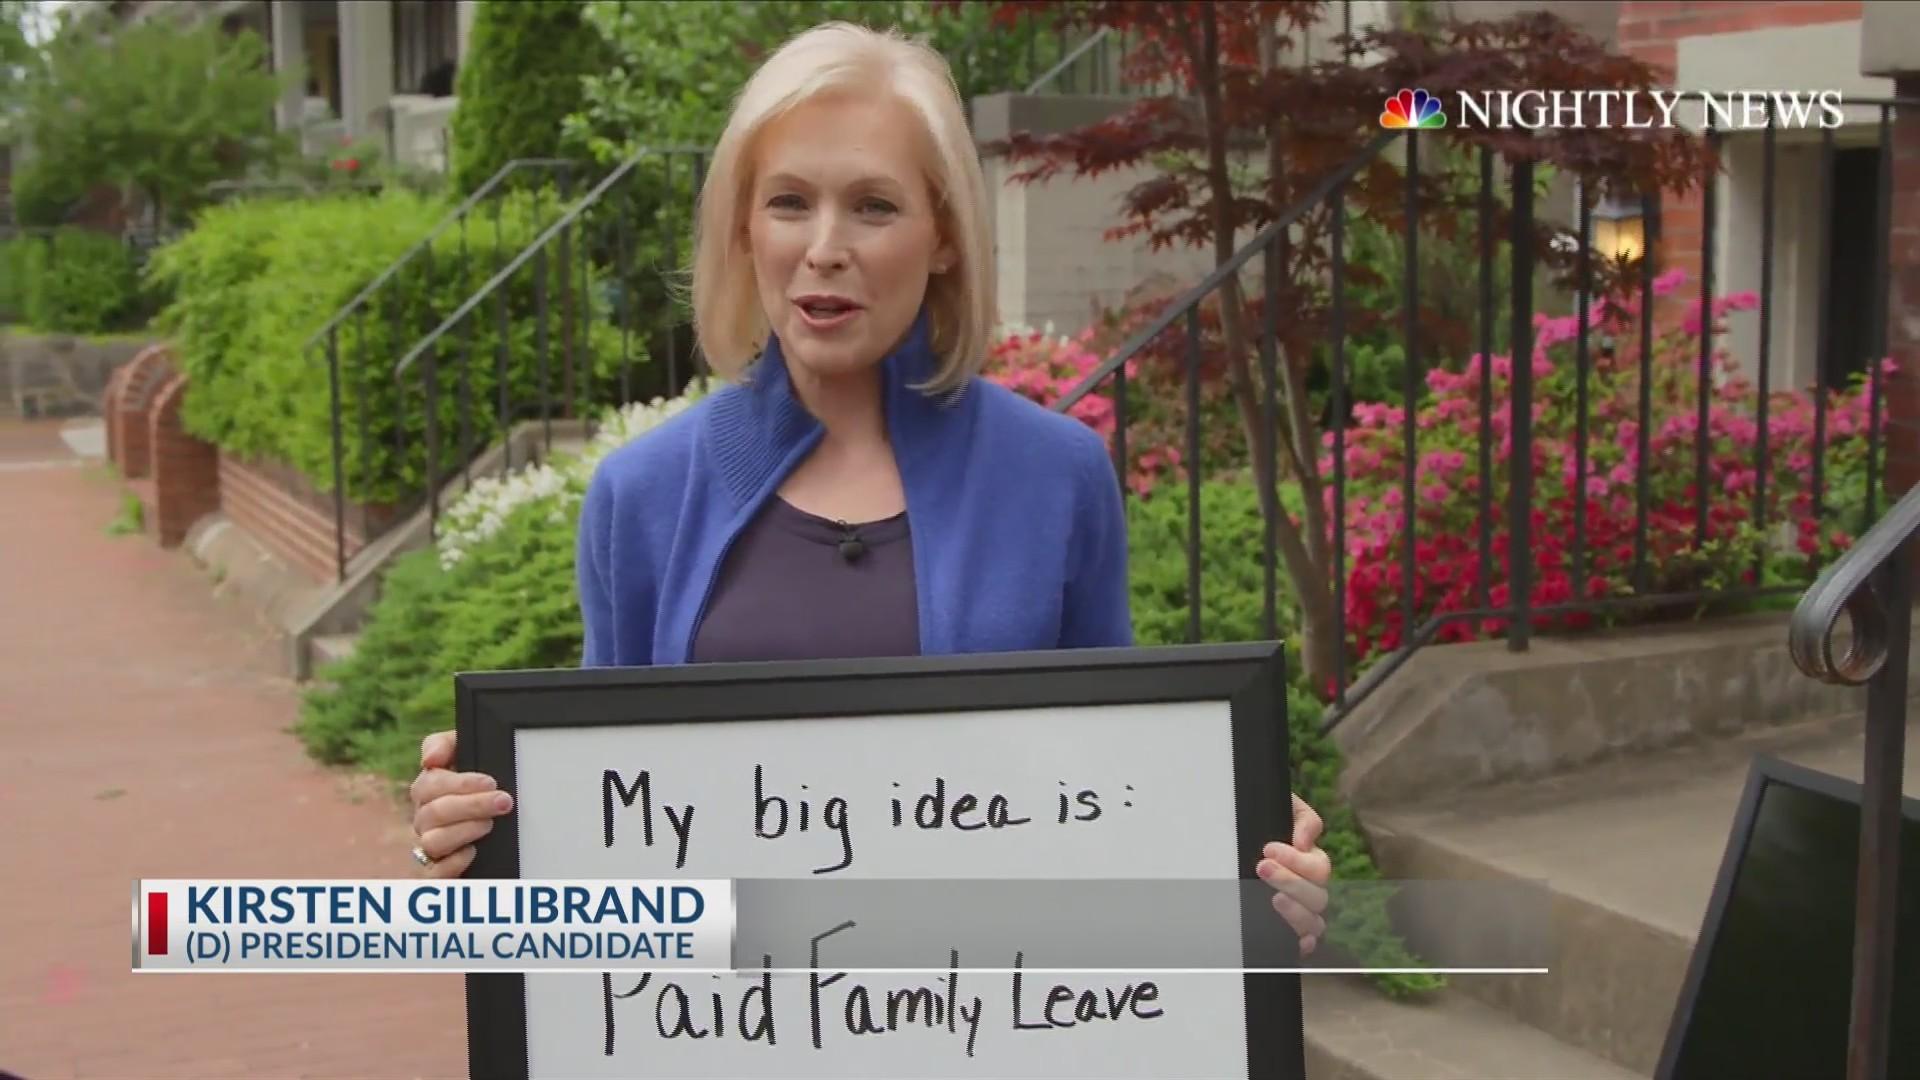 Kirsten Gillibrand's big idea